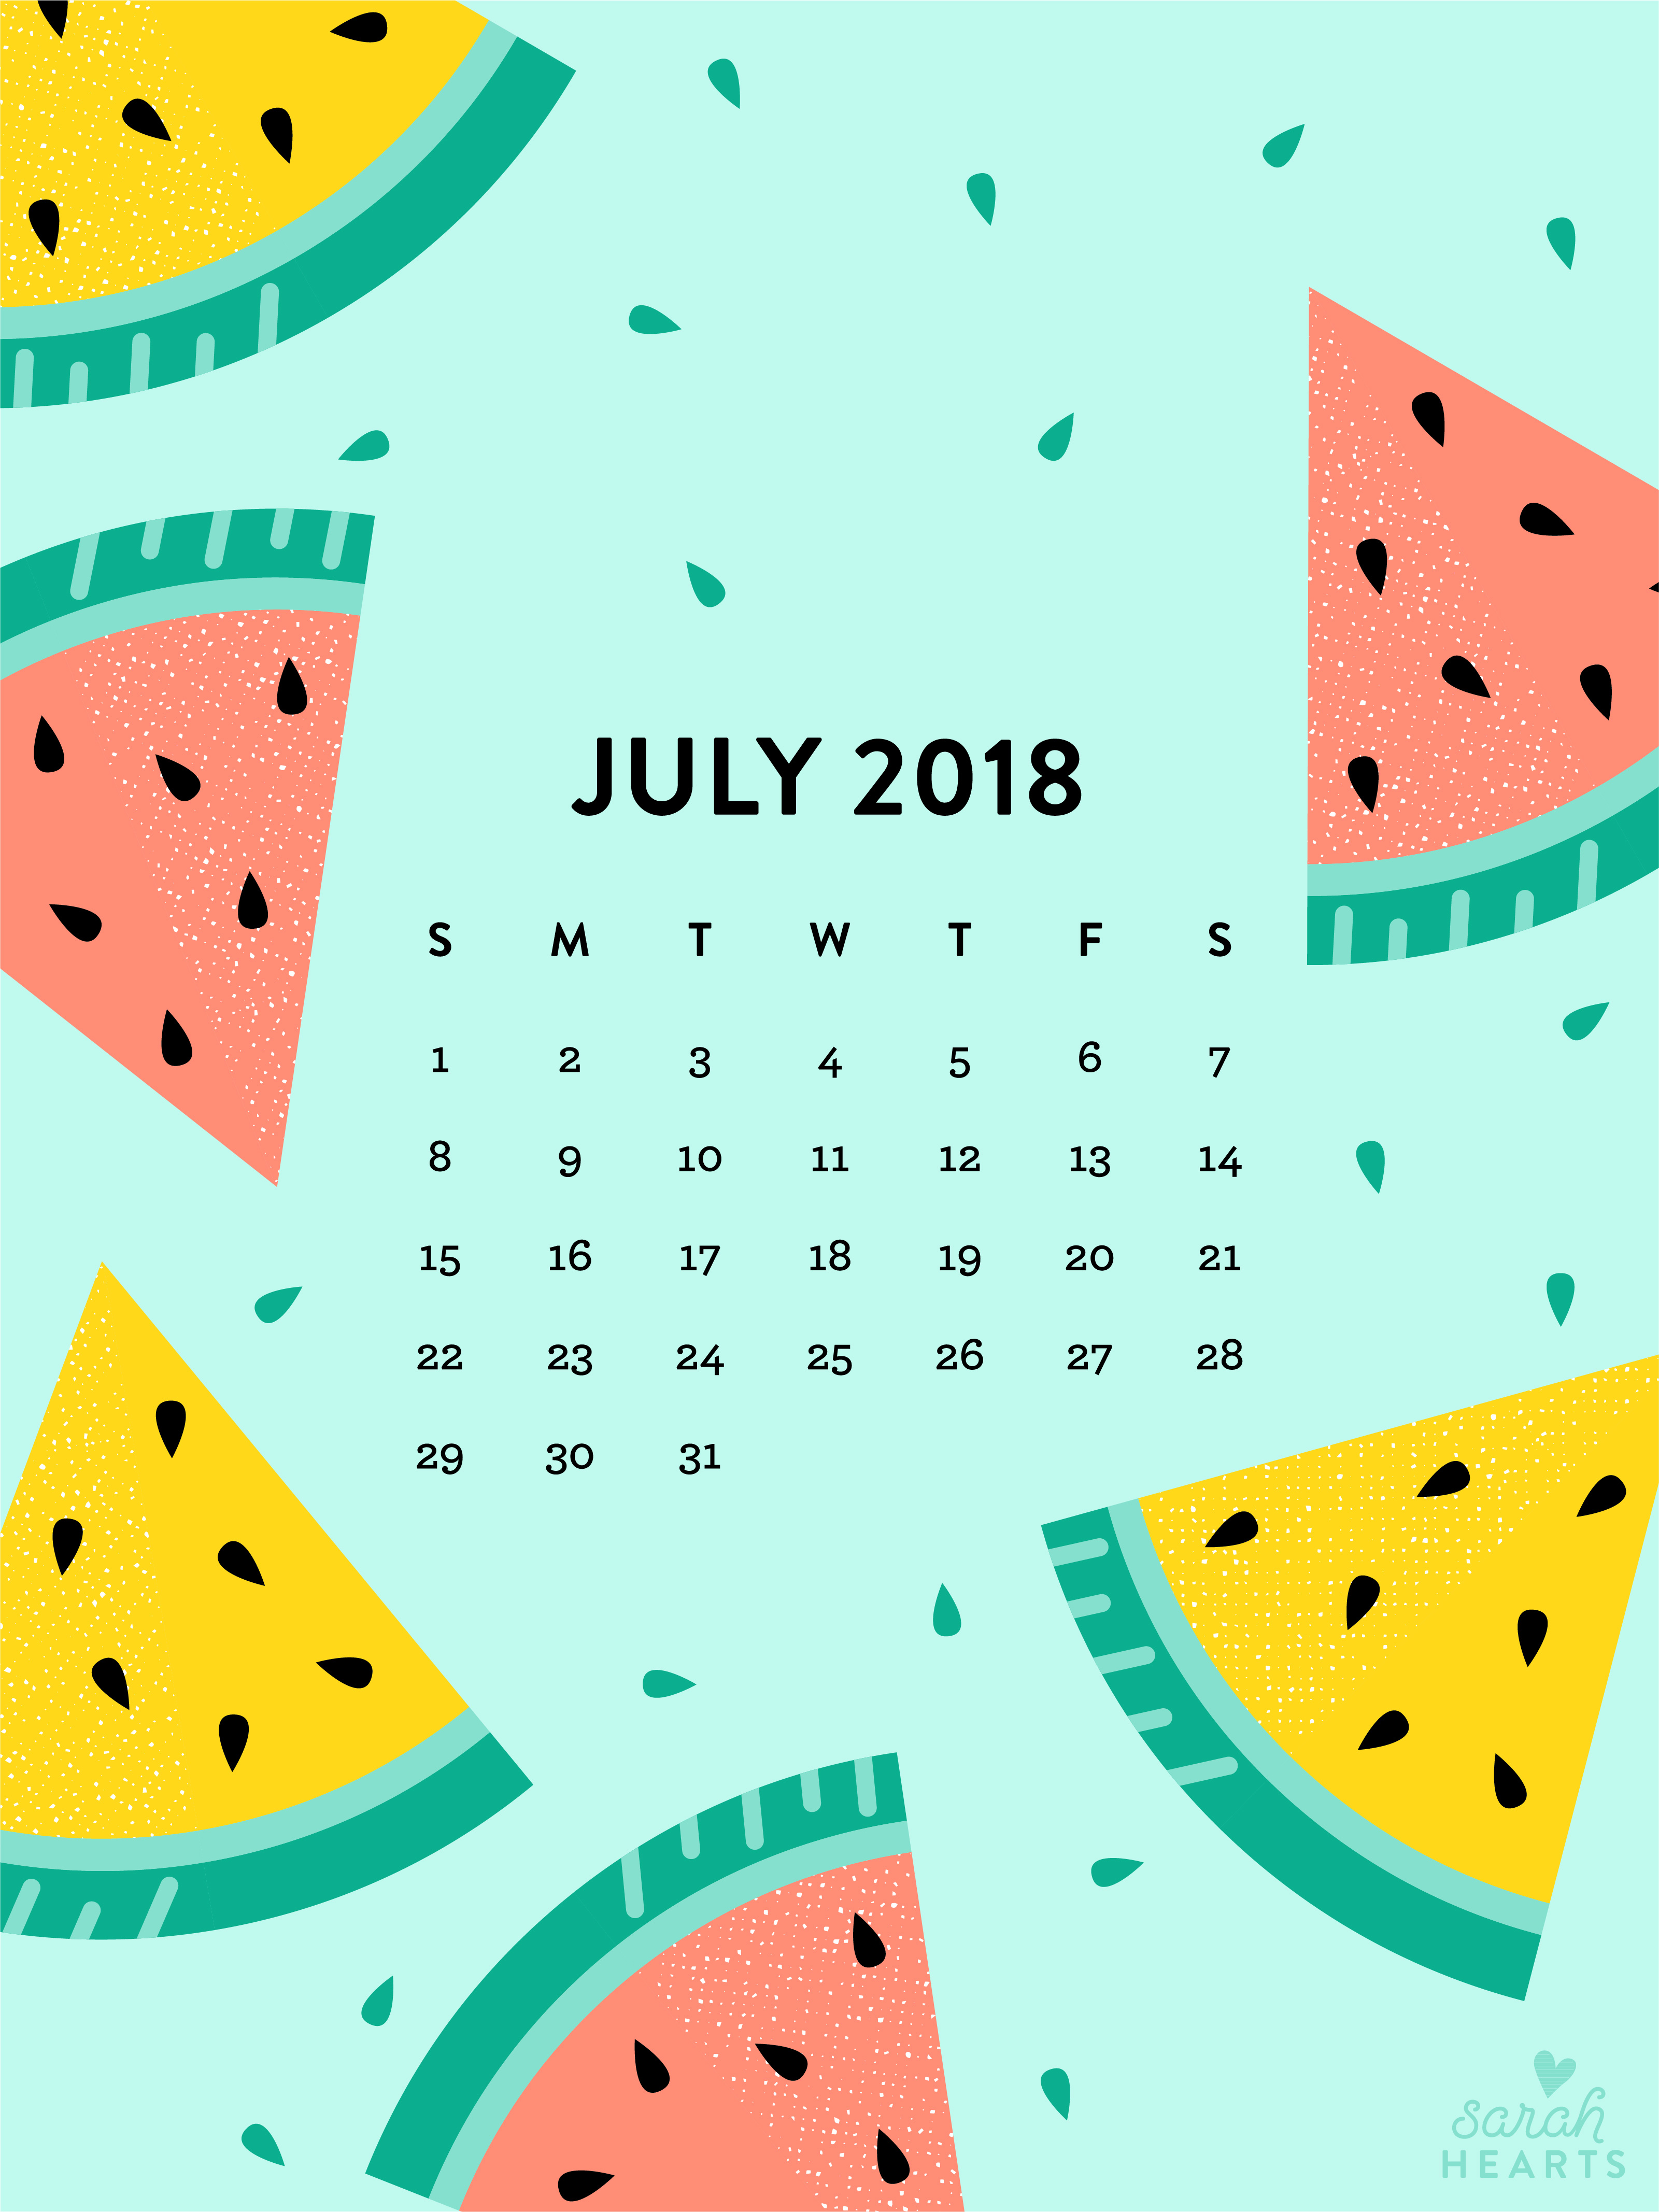 Calendar Wallpaper Ipad : July watermelon calendar wallpaper sarah hearts